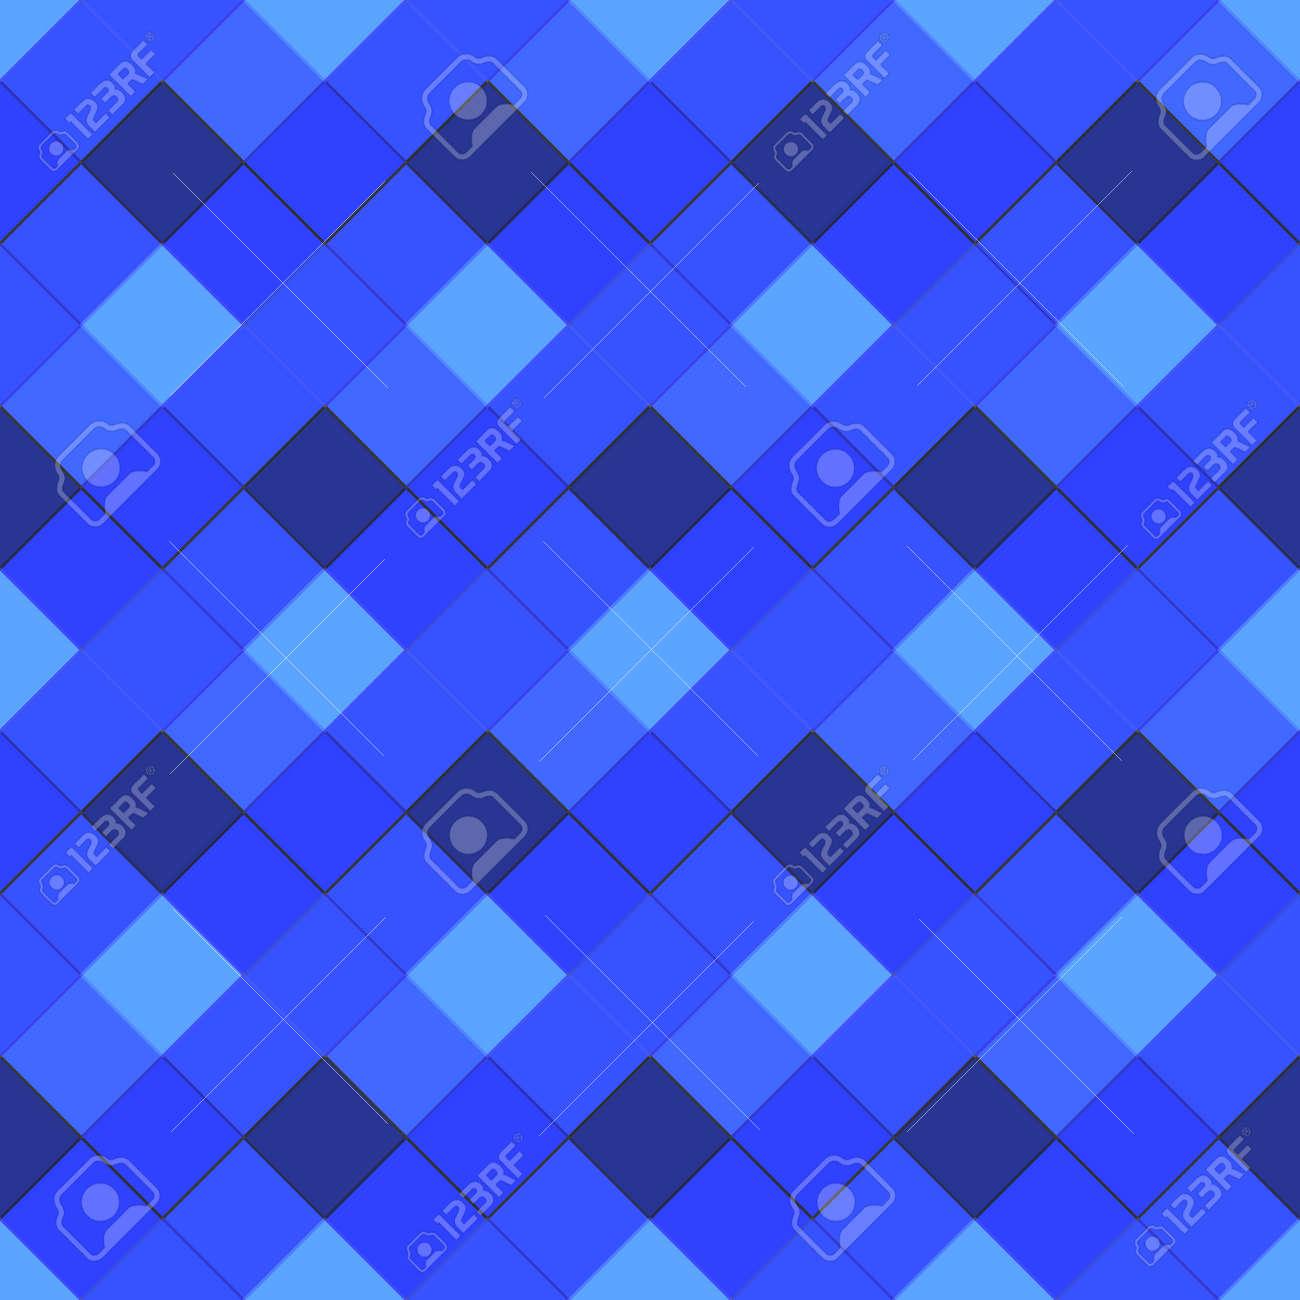 Vector Blue Colors Bulk Ceramic Square Tile Decorative Seamless ...